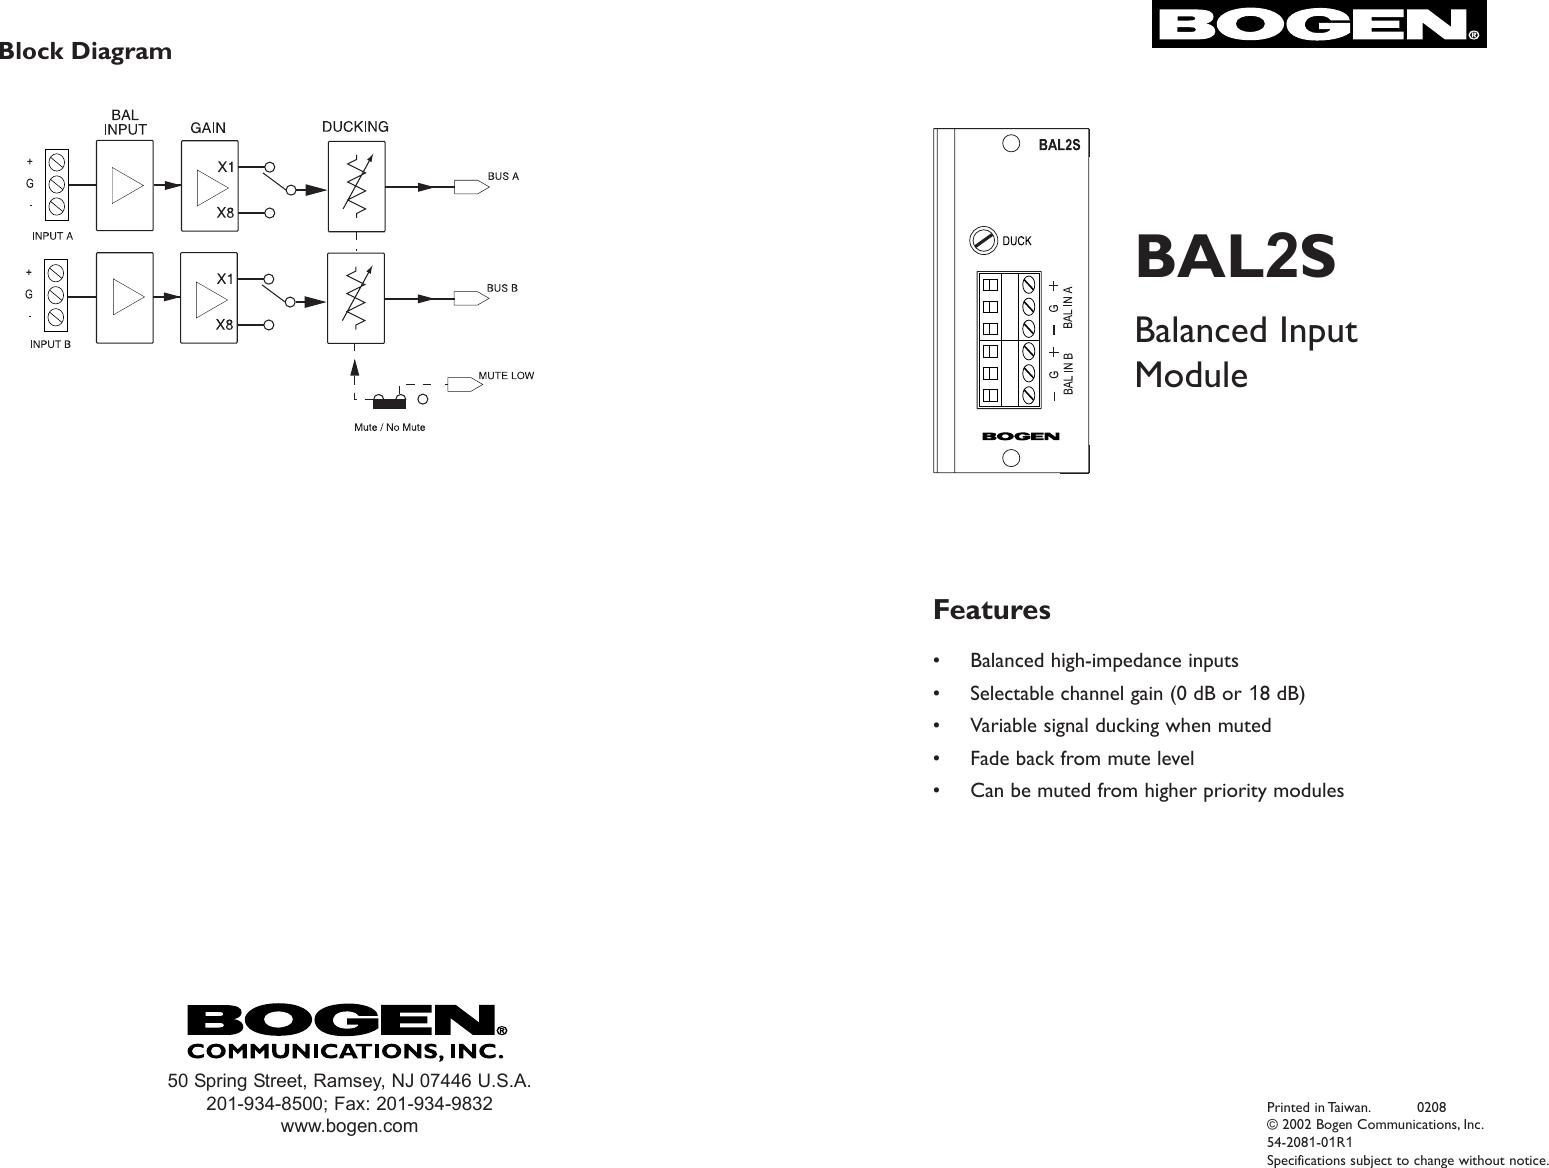 Bogen Communications Table Top Game Bal2s Users Manual Balanced Level 0 Block Diagram Input Module